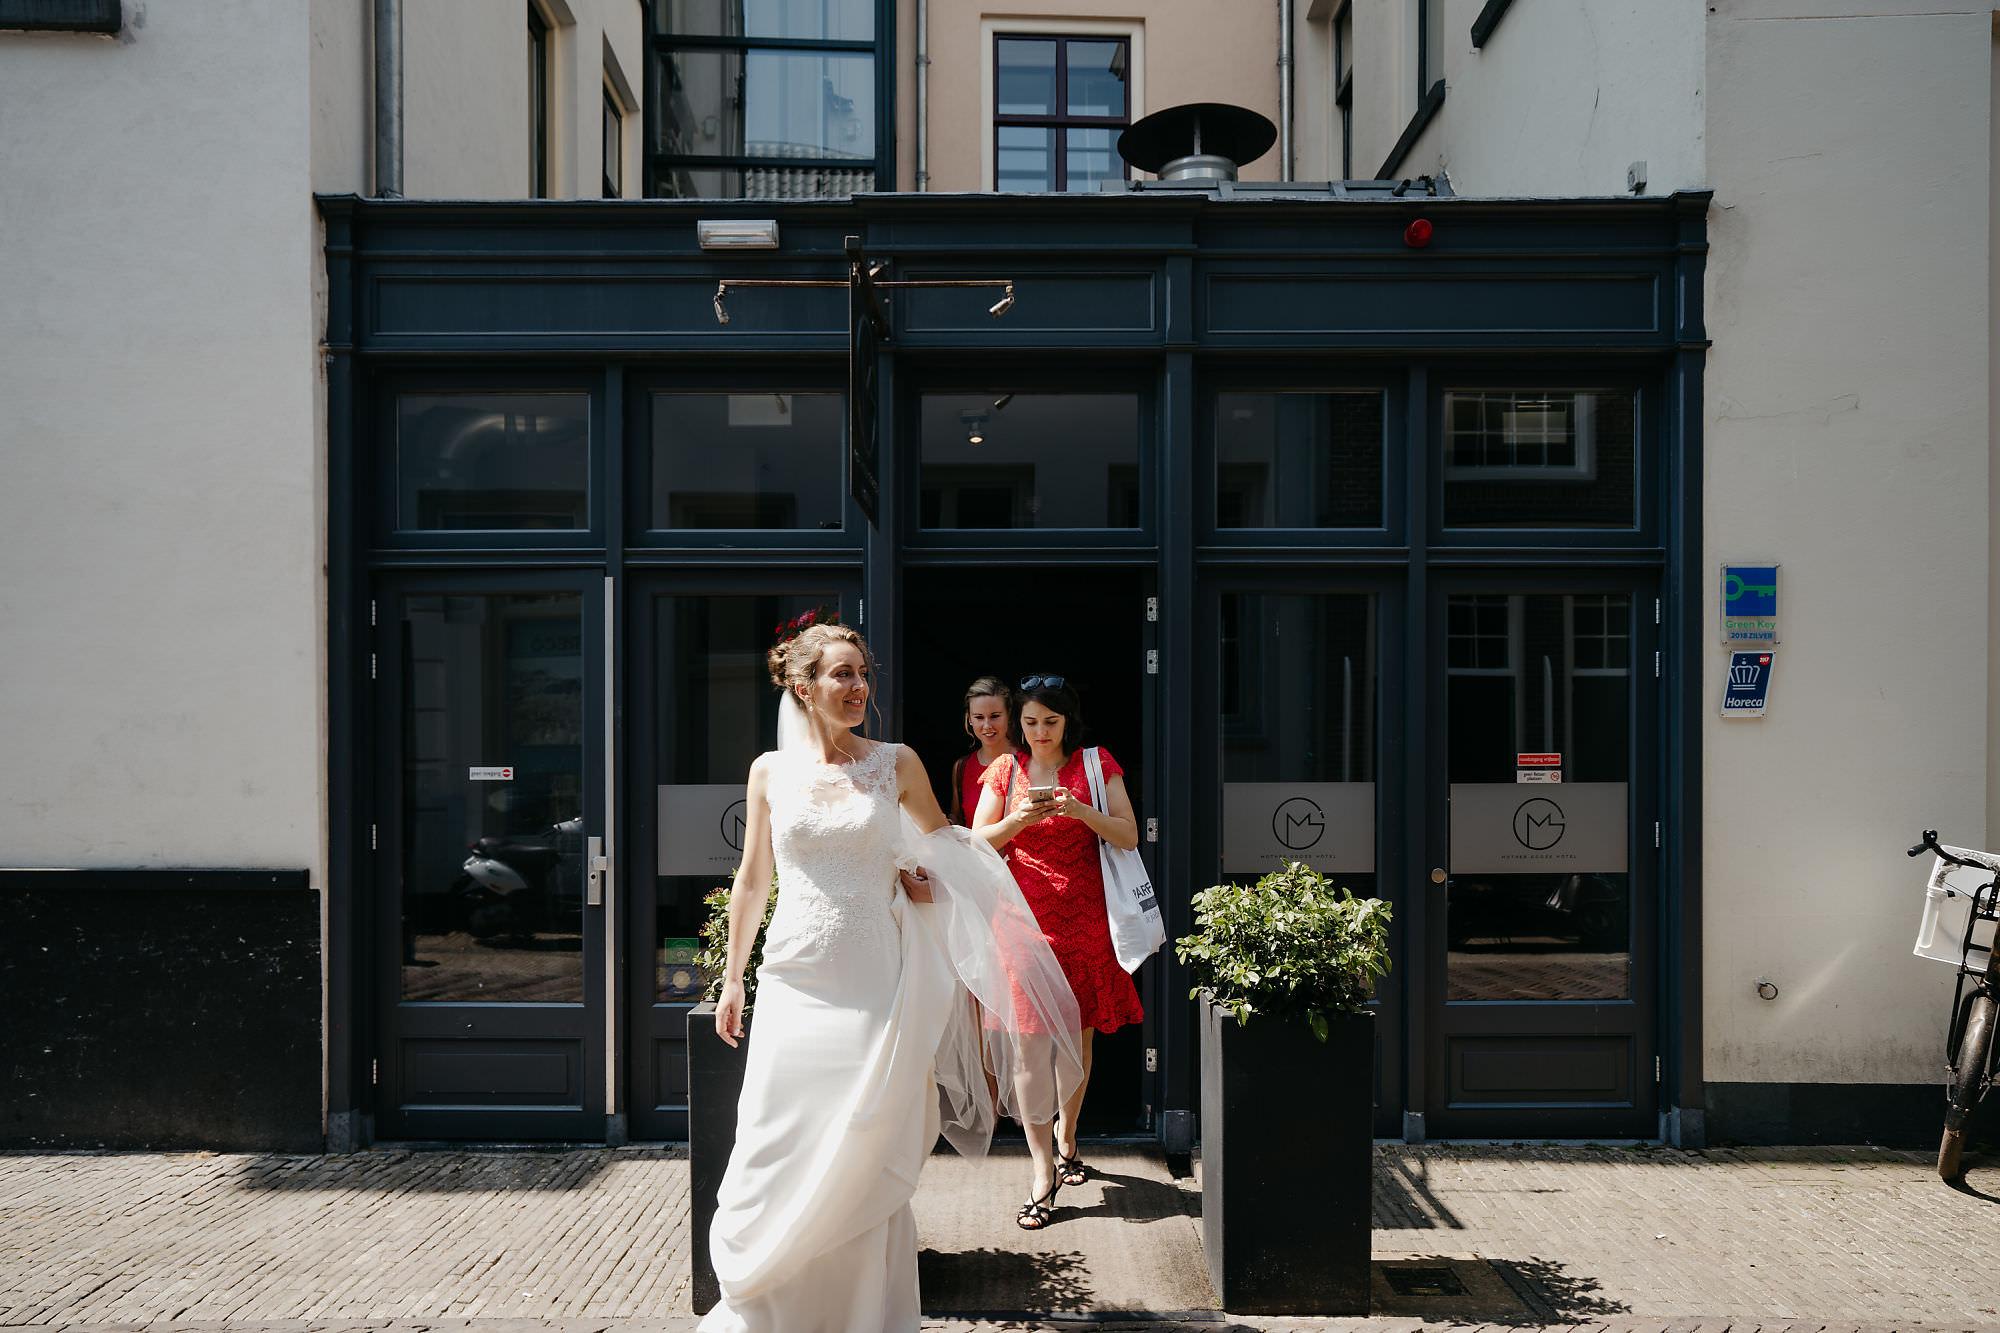 wedding utrecht photographed by photographer mark hadden